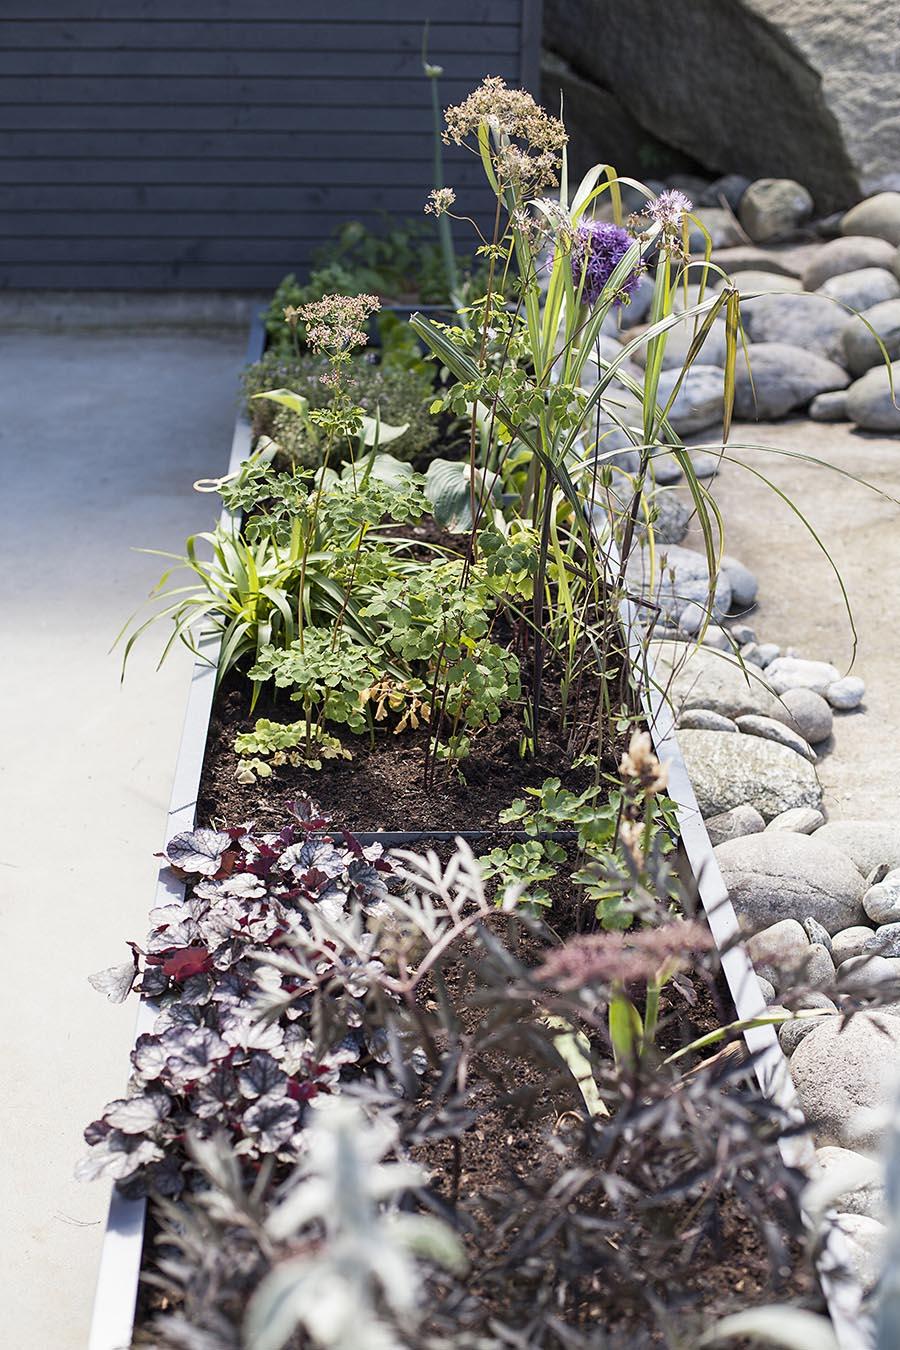 Bedd-plantekasser-med-ulike-stauder-og-med-rullestener-langs Hagemøbler og utemøbler - Fine design